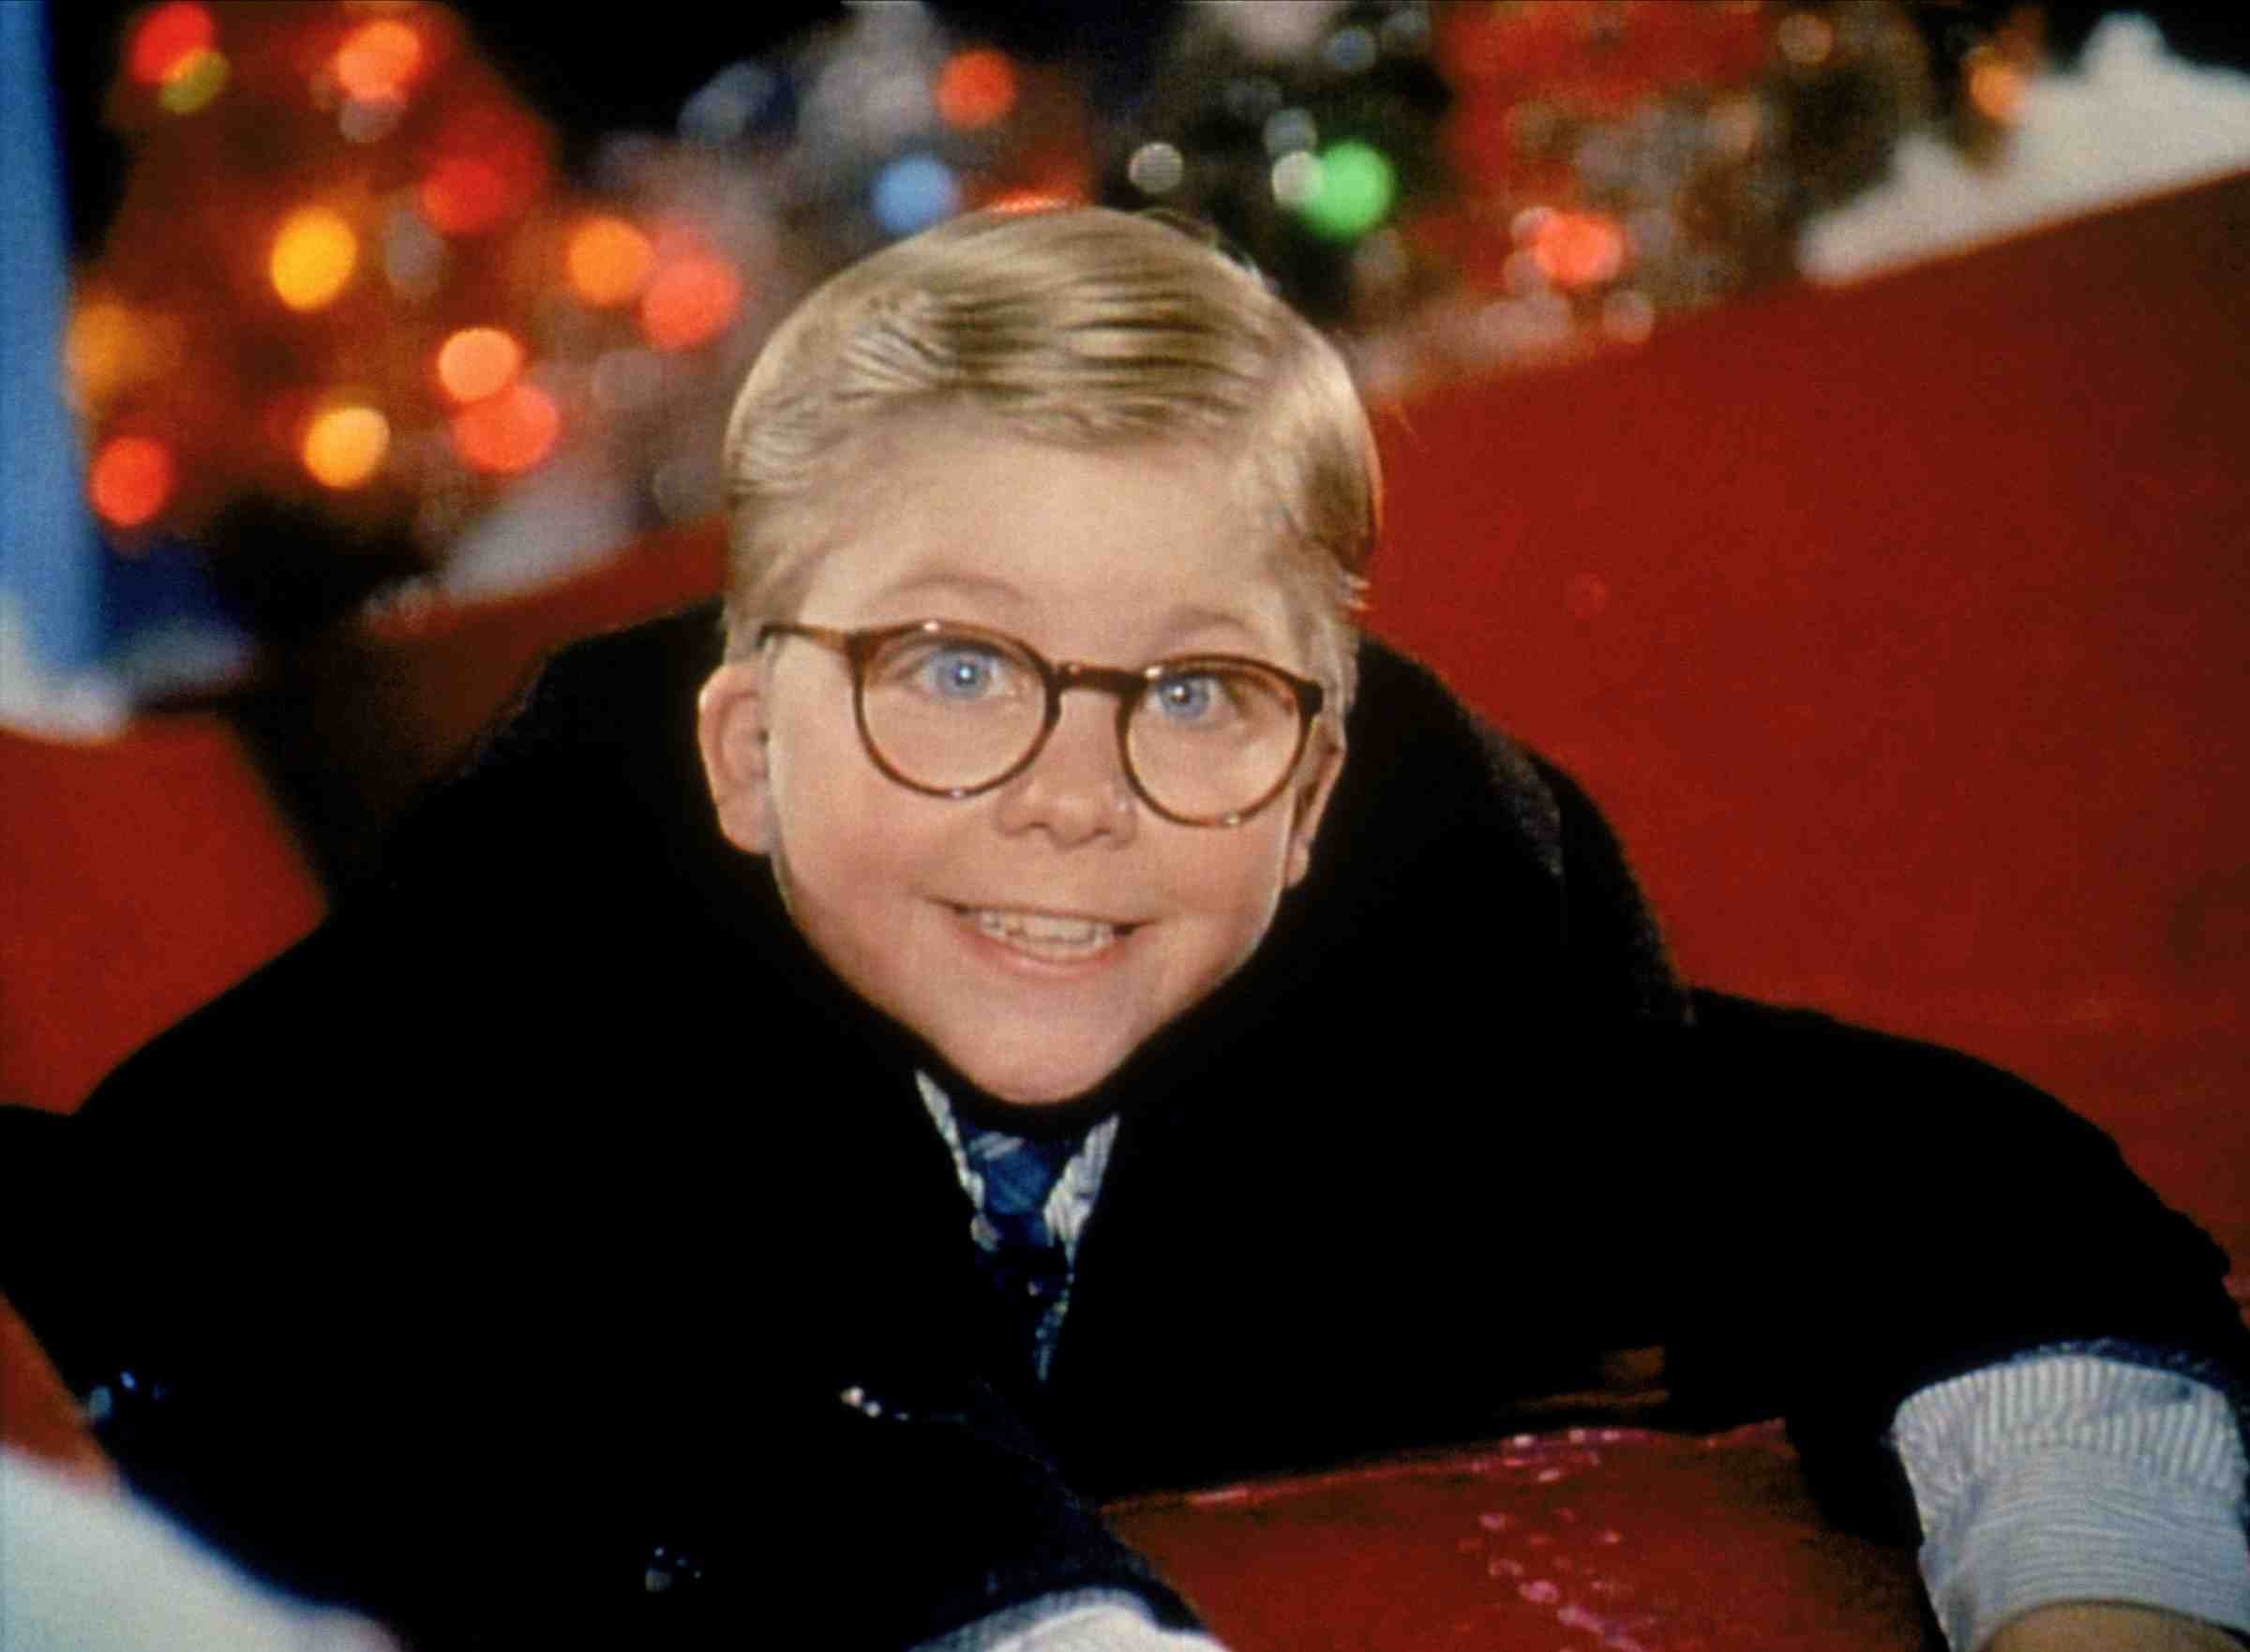 A Christmas Story  Ralphie  A Christmas Story 2 Ralphie